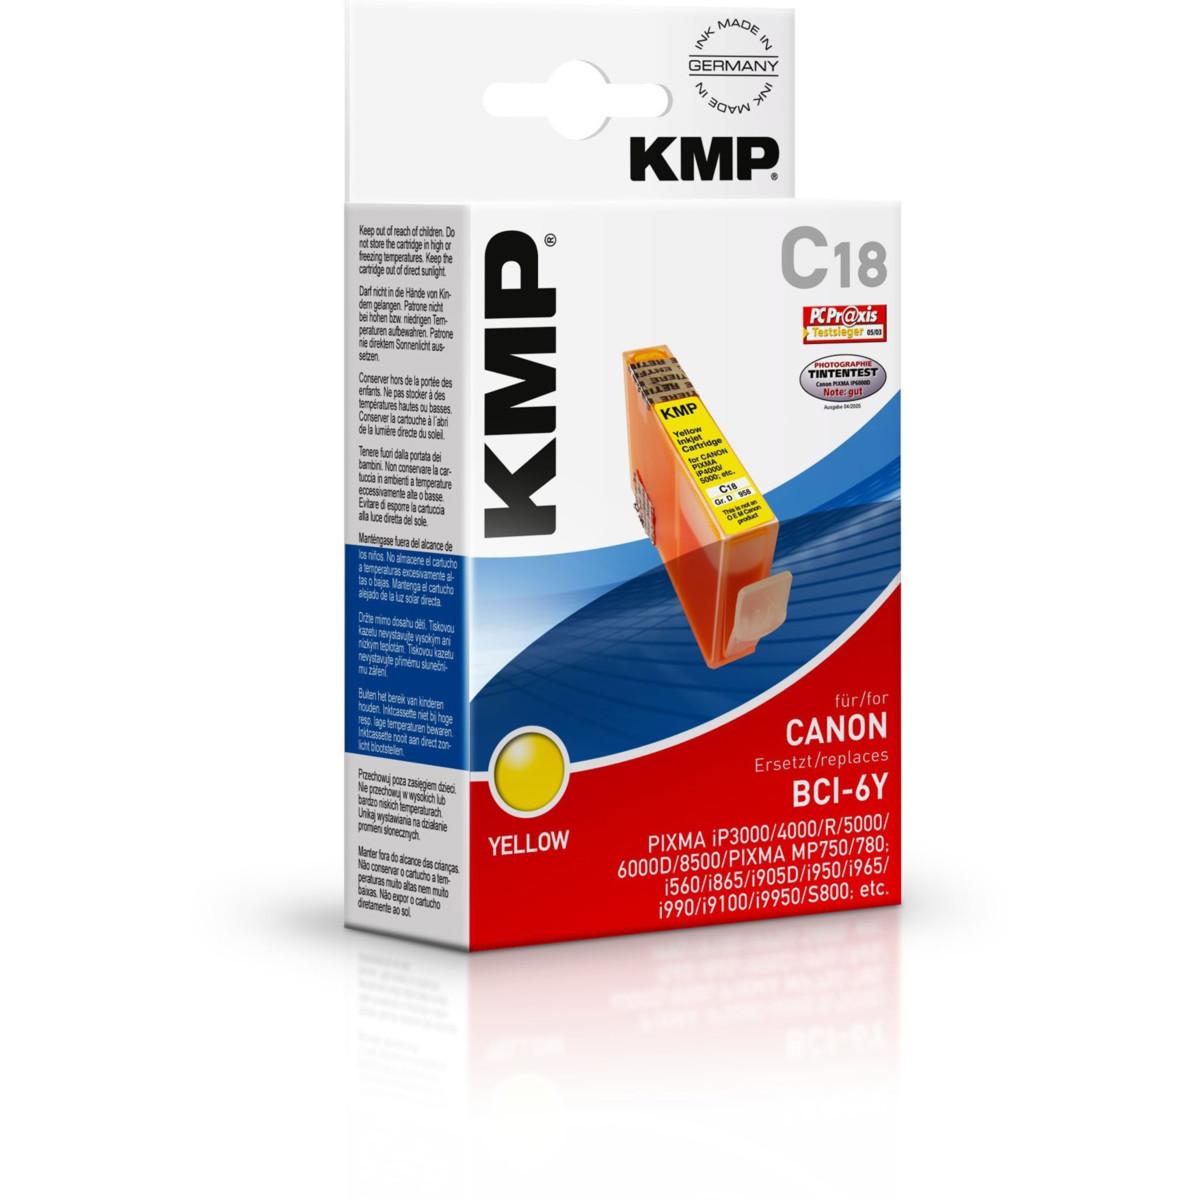 KMP Cartridge Canon BCI-6Y, - kompatibilný s čipom (Žltá)